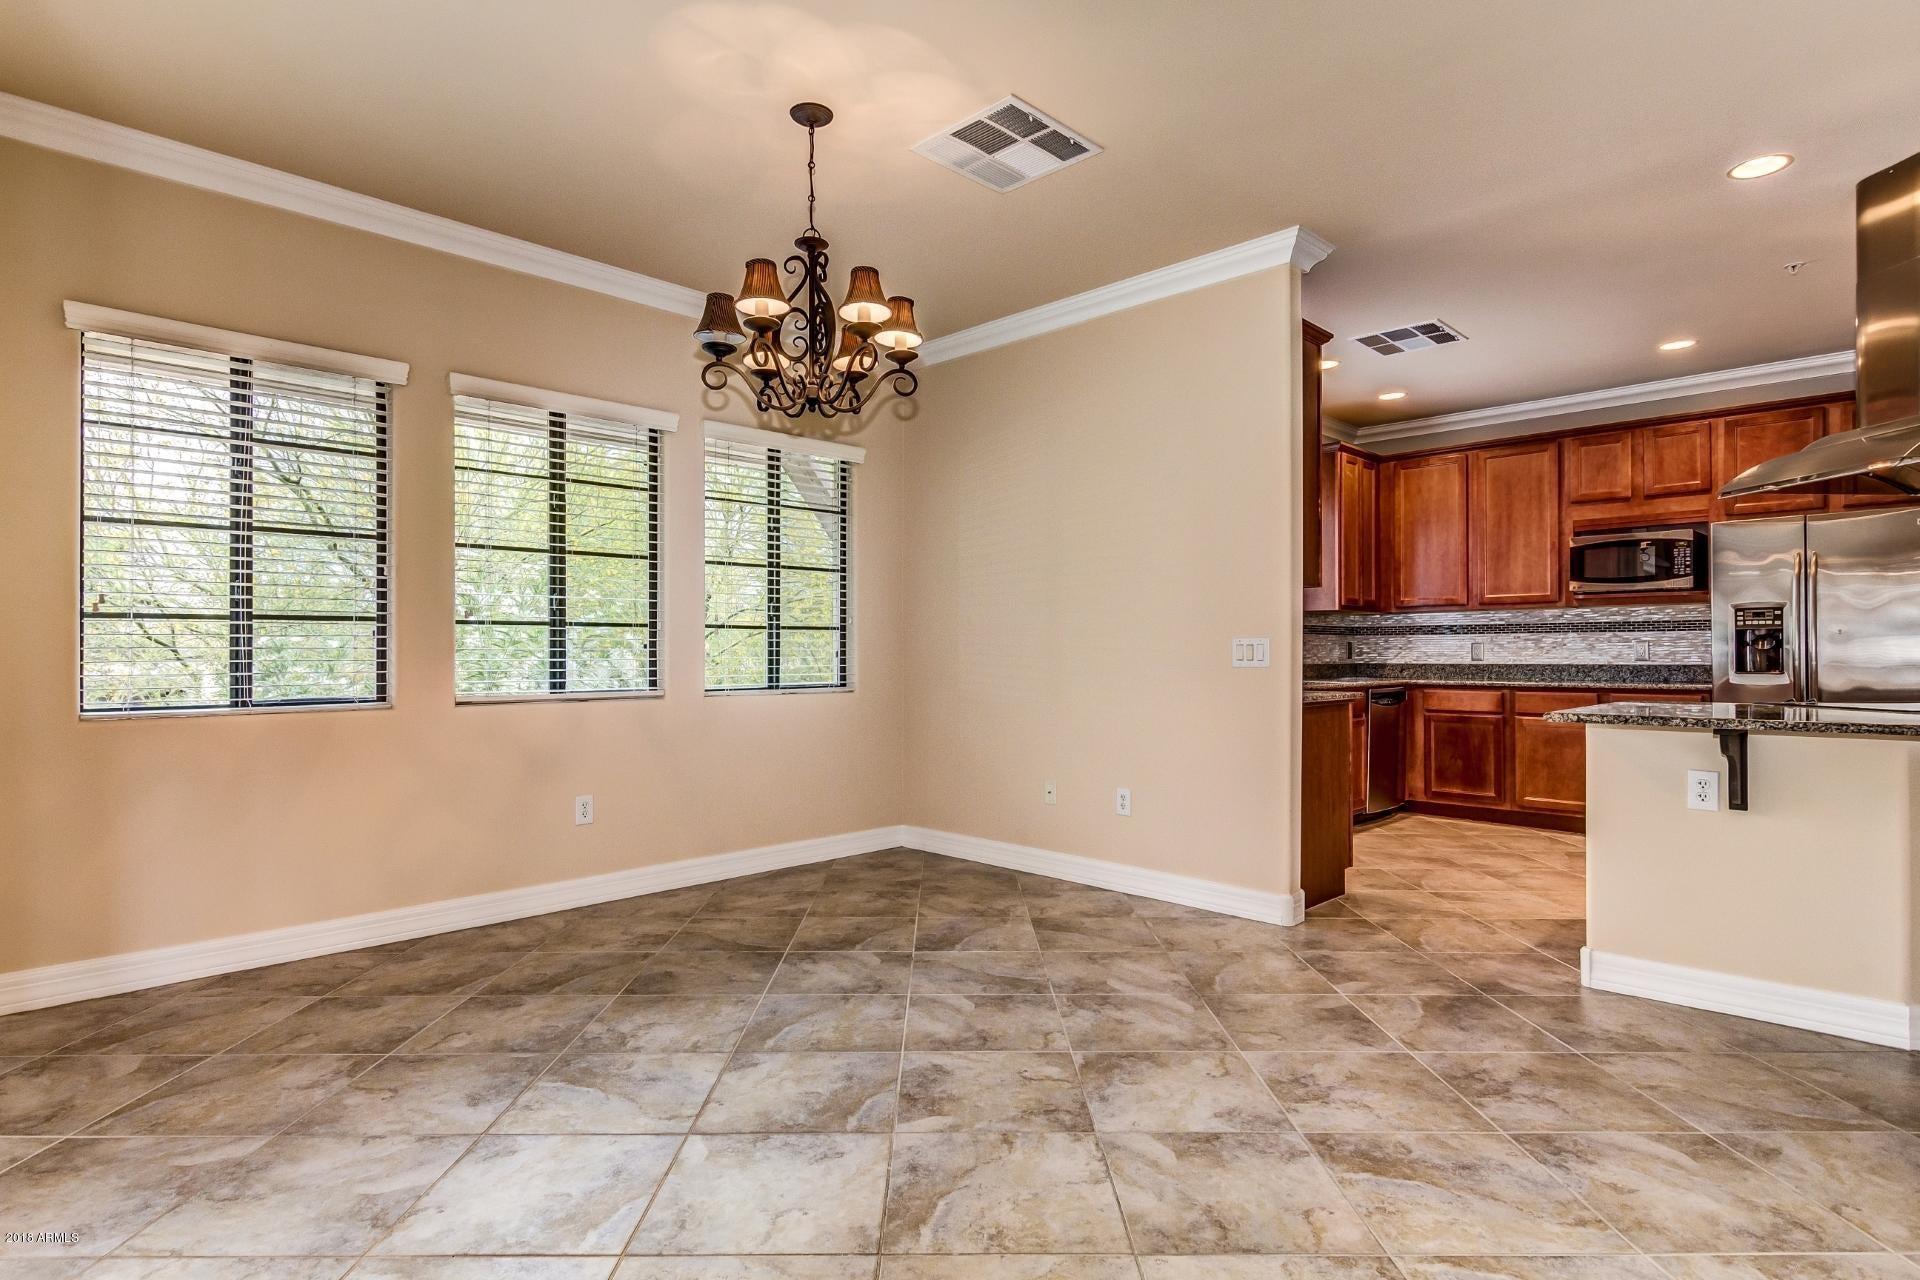 10757 N 74TH Street Unit 2037 Scottsdale, AZ 85260 - MLS #: 5760972